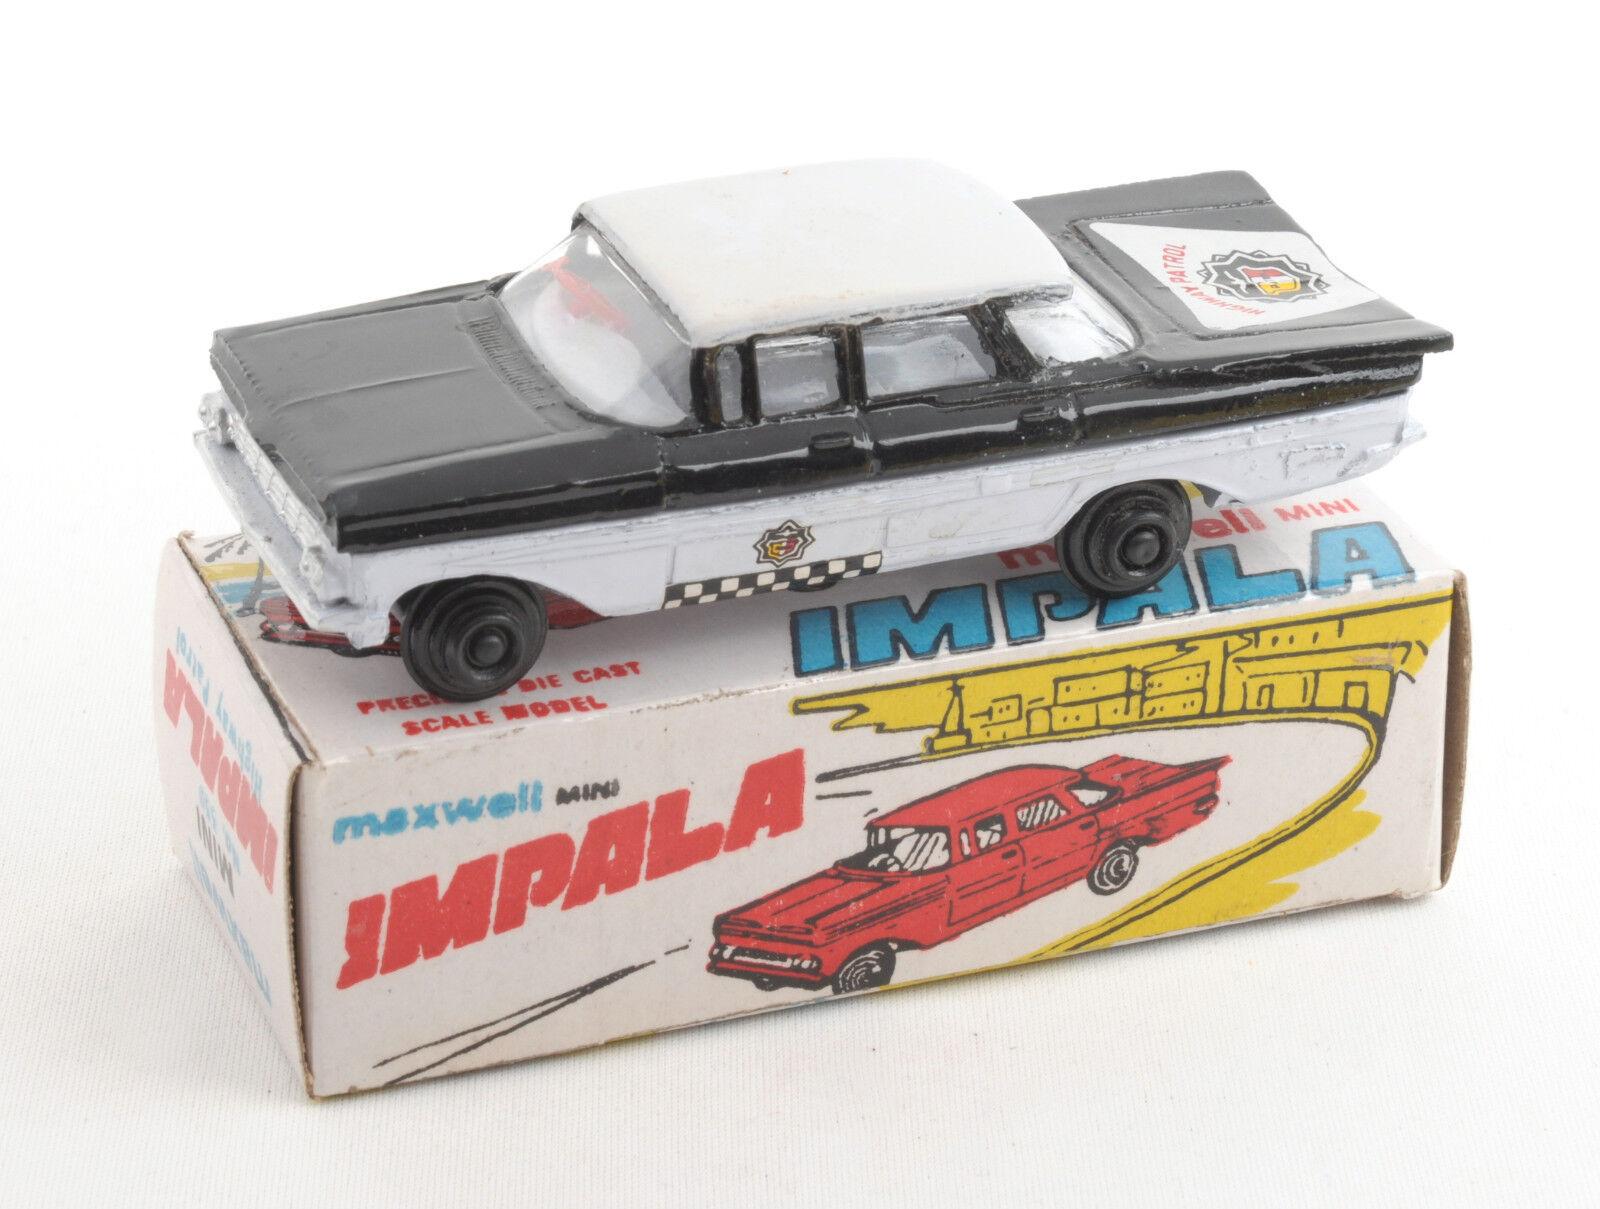 Maxwell Juguetes (India) No.559 Maxwell patrulla carretera Mini Impala 1970s   MIB